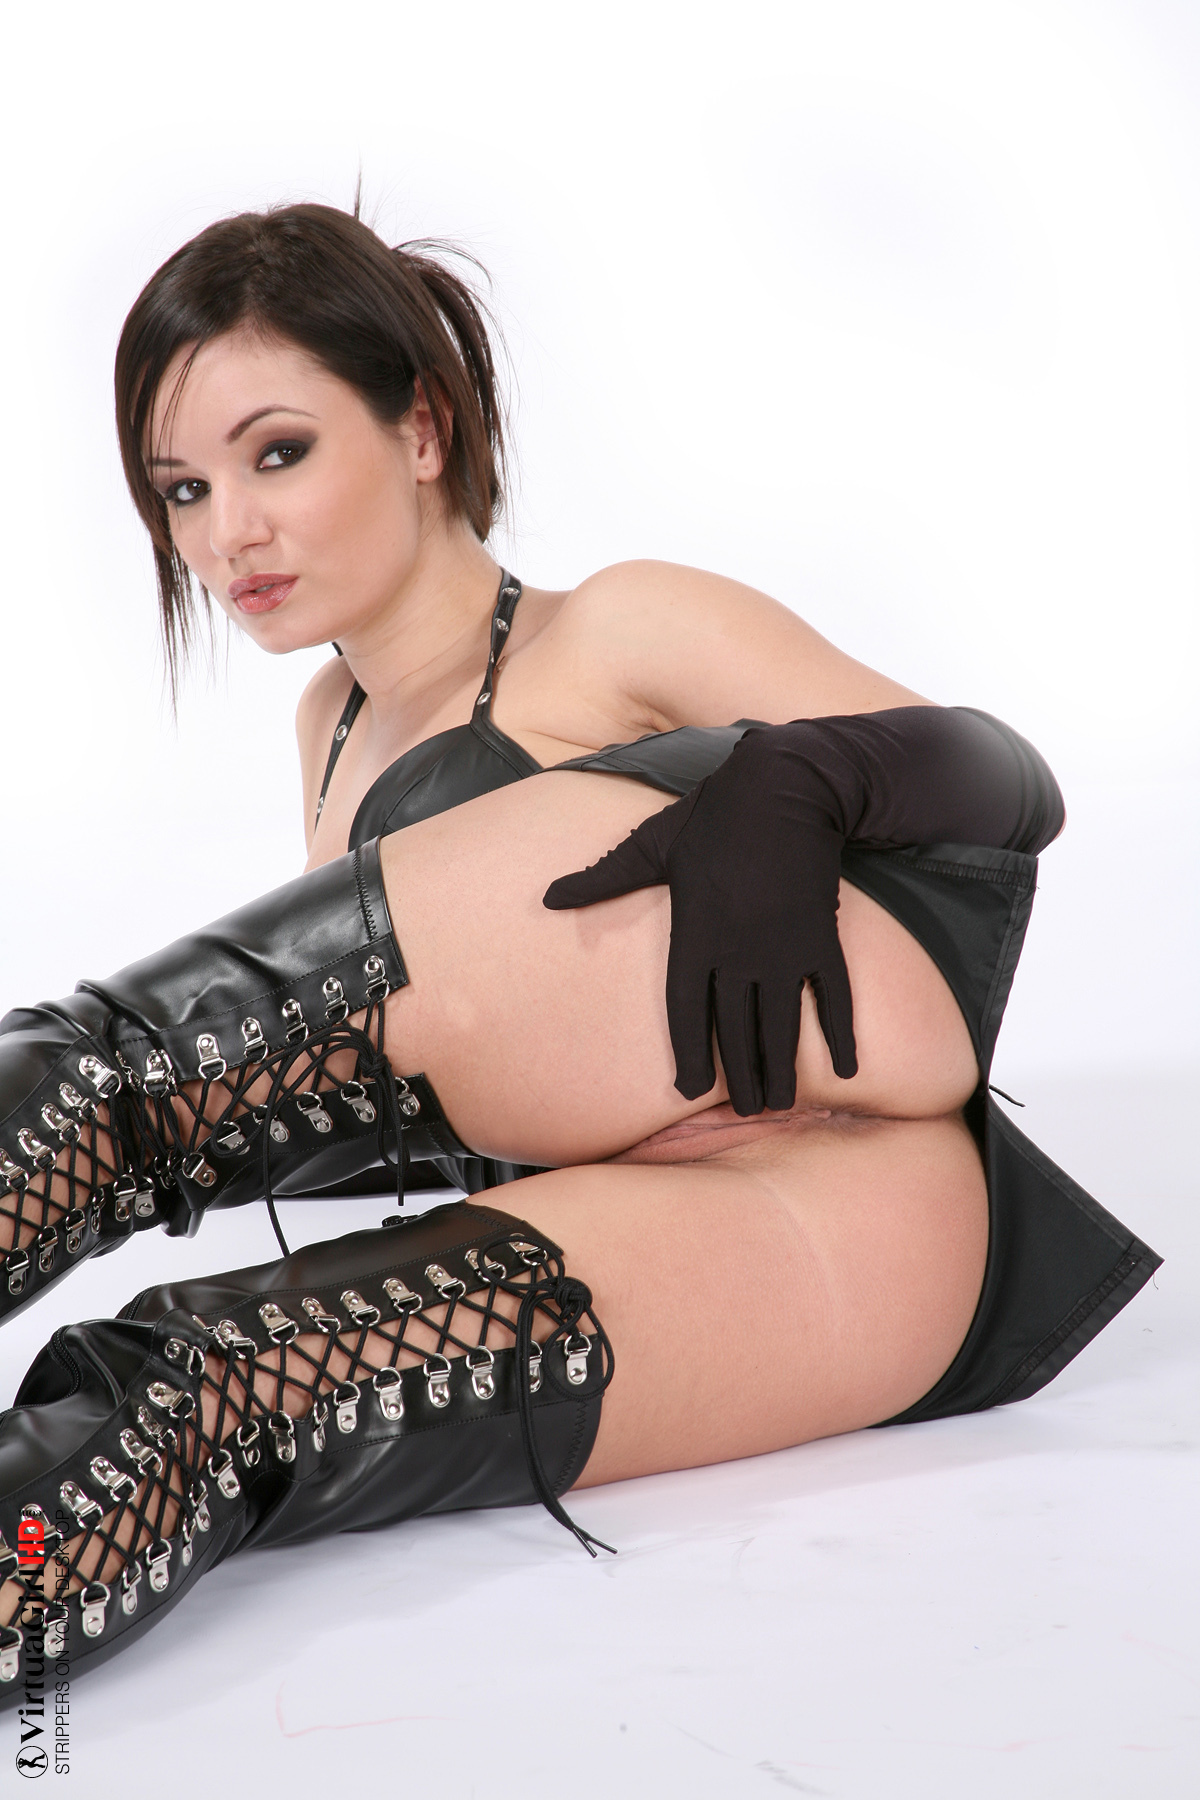 hot sexy girls stripping on cam